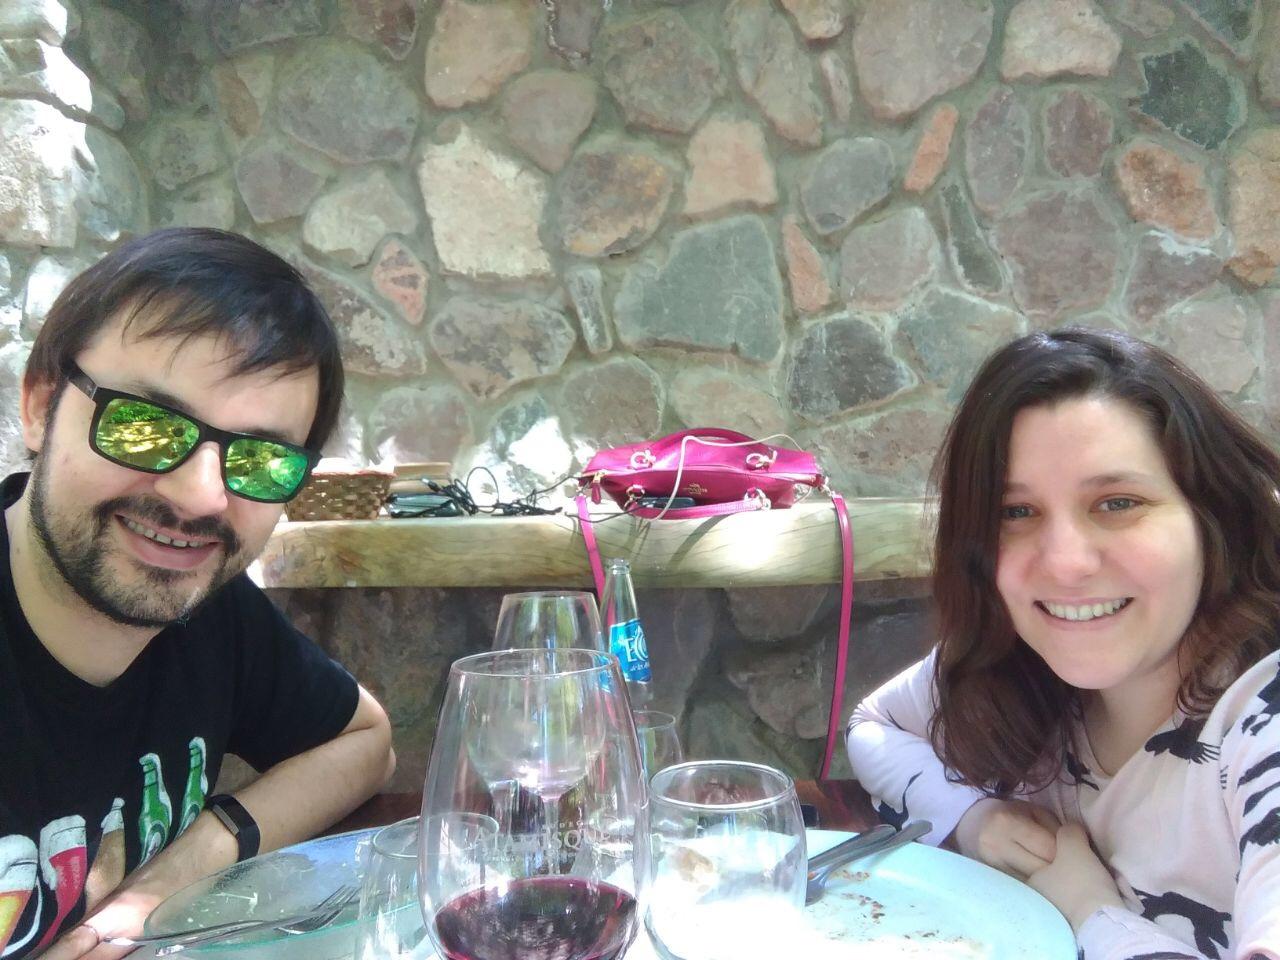 IMG 8396 - Almorzando en la Bodega Atamisque de Mendoza